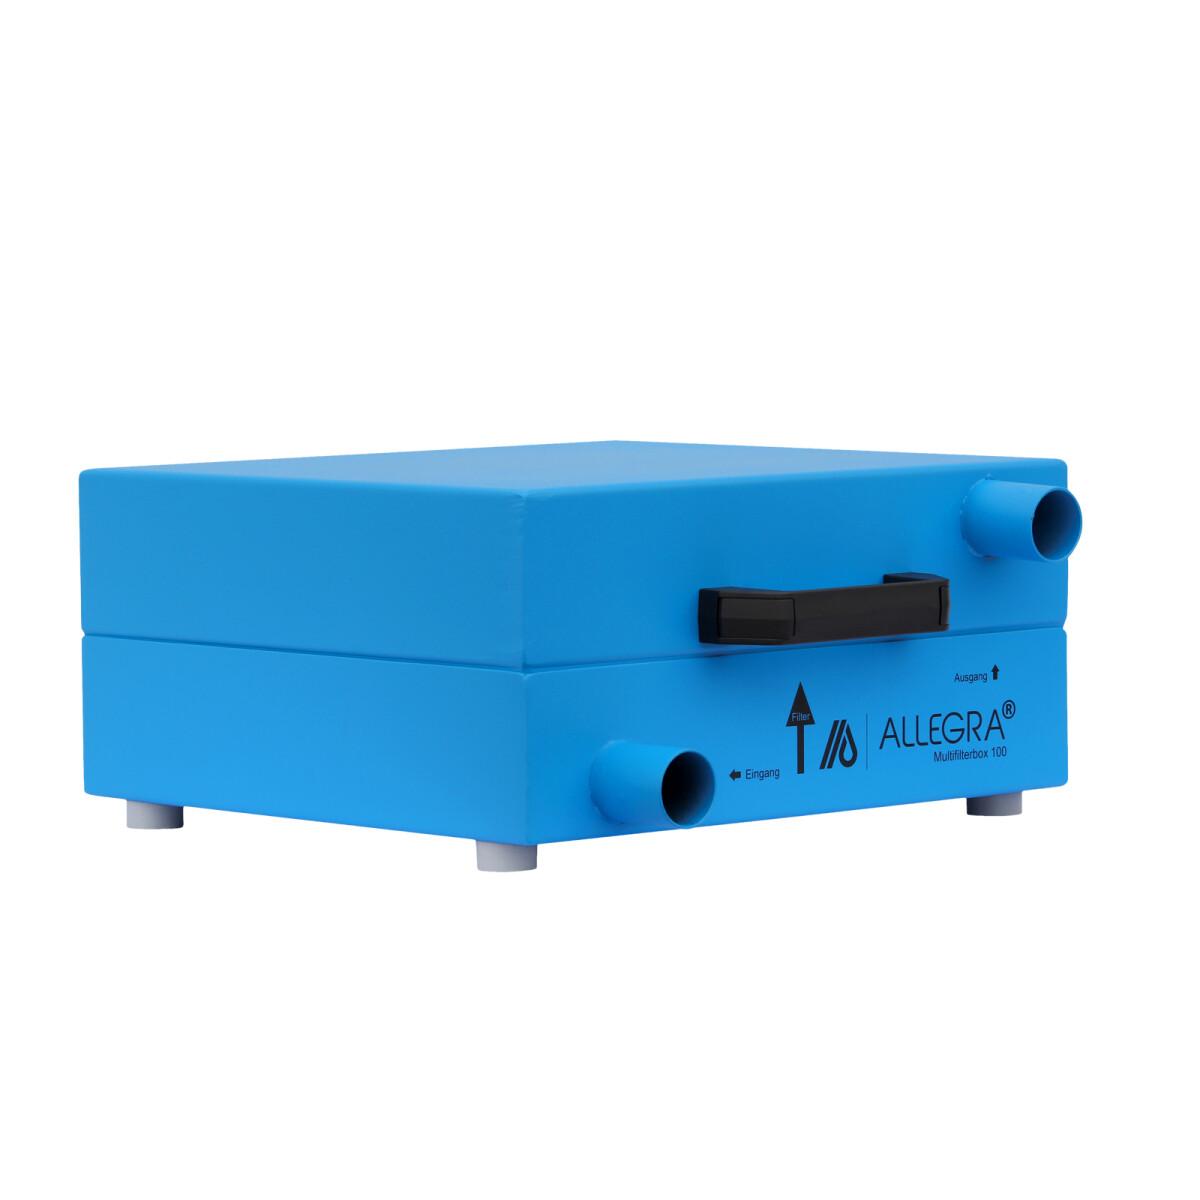 ALLEGRA Multifilterbox 100 mit Hepa-Filter, Anschluss: 38 mm